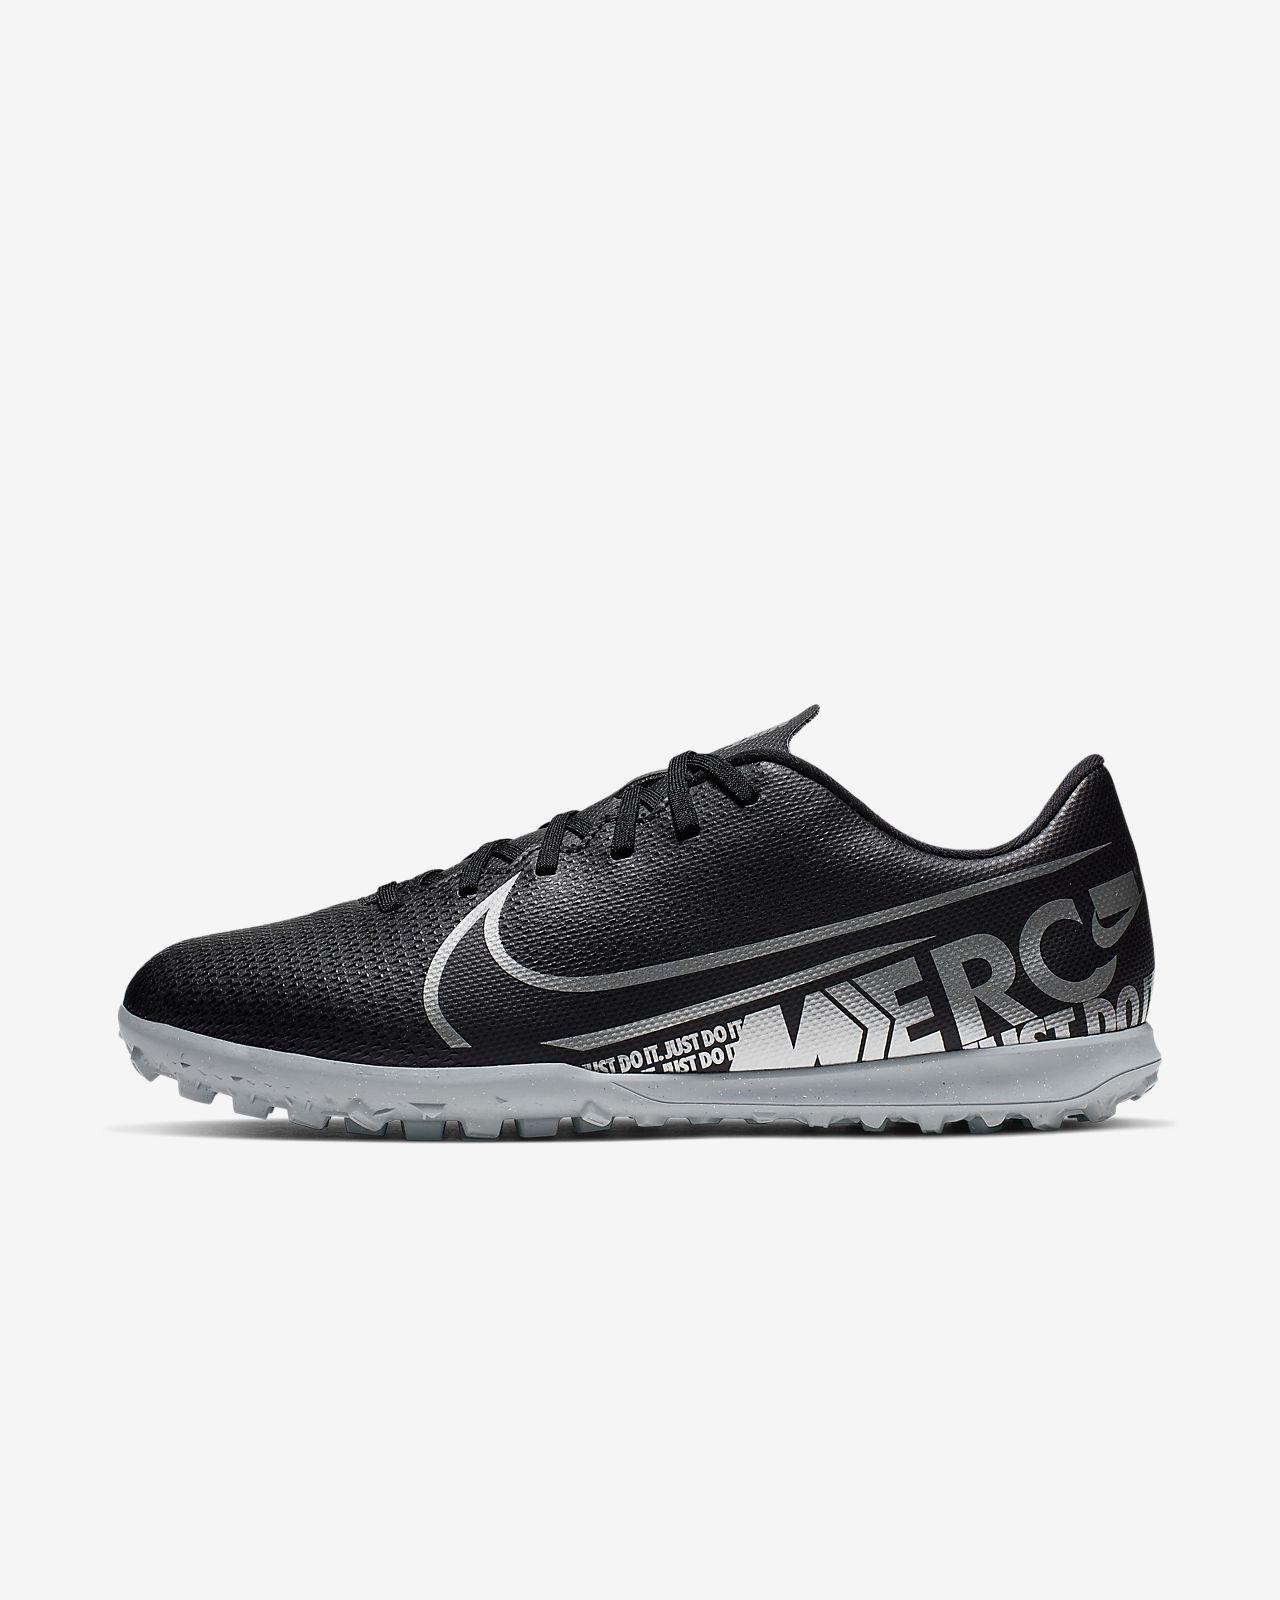 Nike Mercurial Vapor 13 Club TF Botas de fútbol para hierba artificial o moqueta - Turf